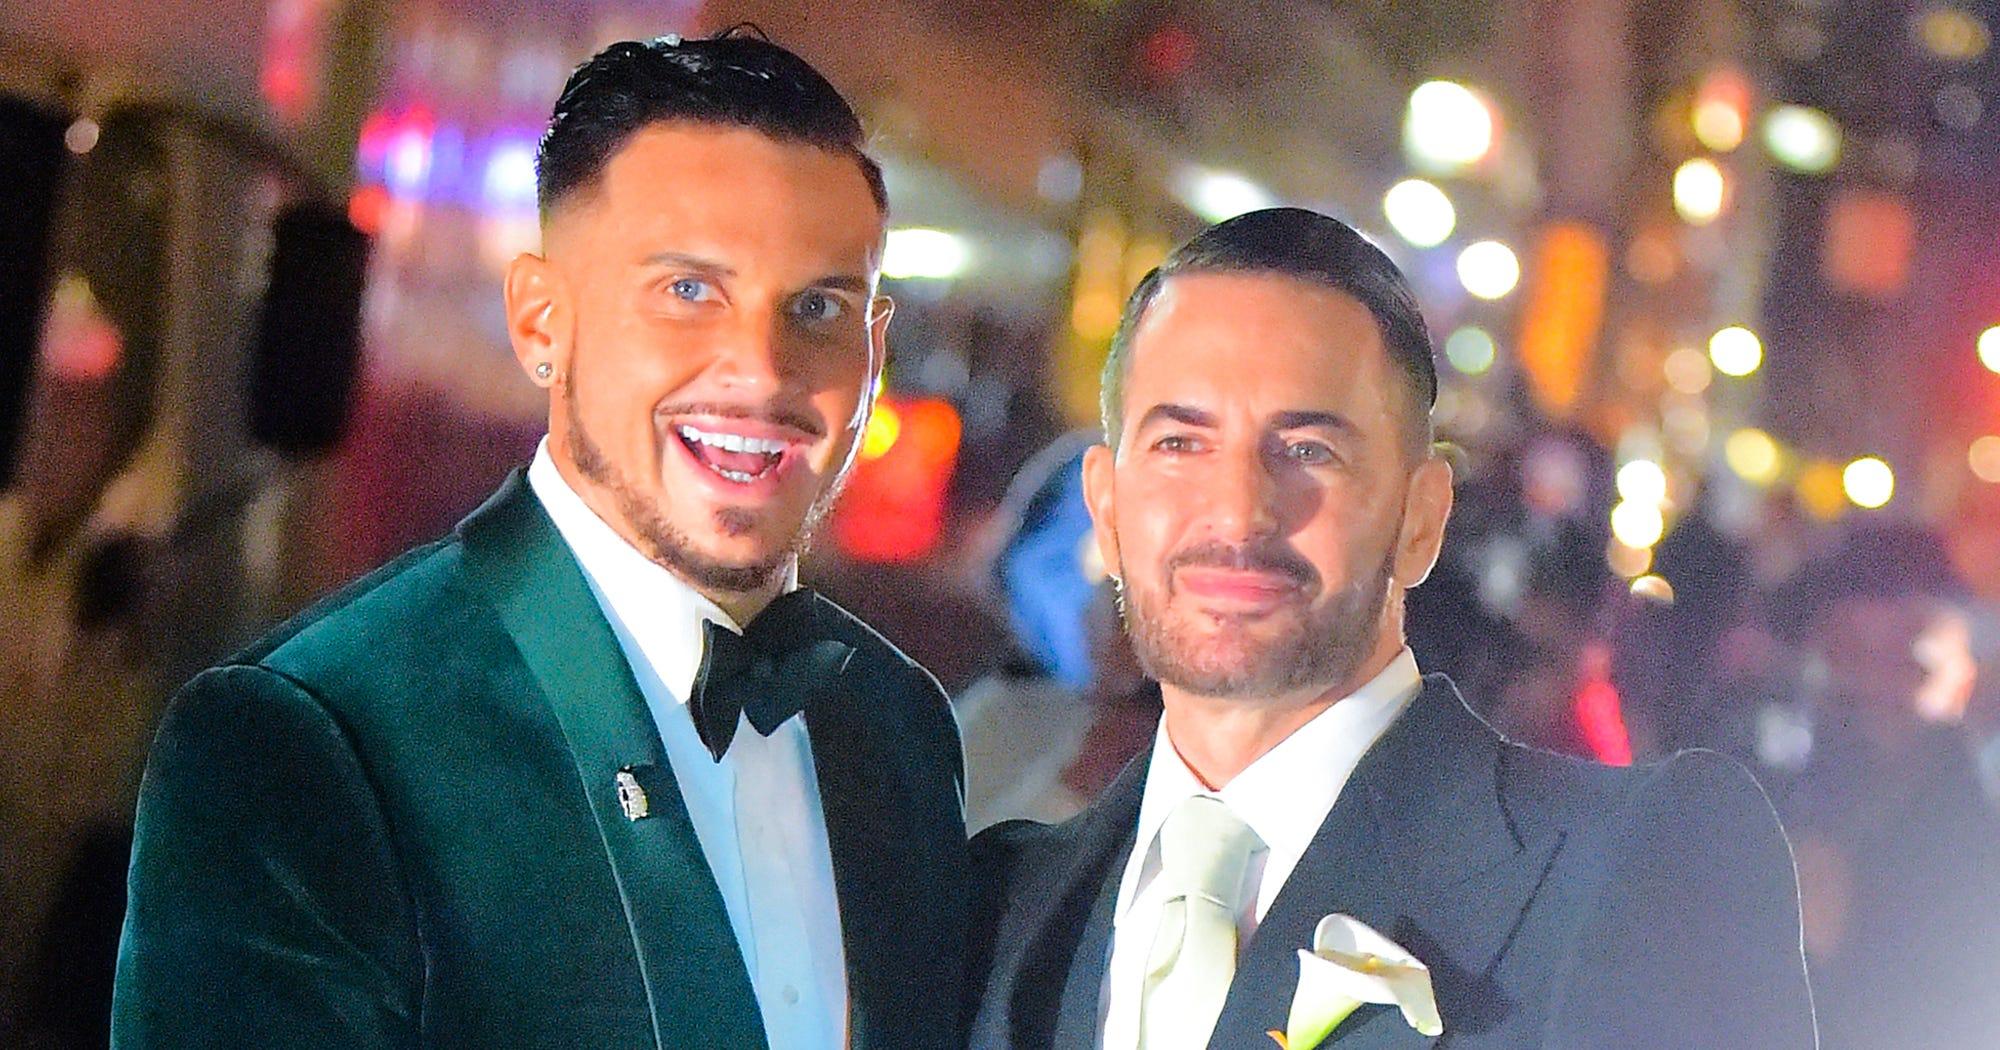 bc9156c622 Marc Jacobs Married Char Defrancesco, Celeb Guests